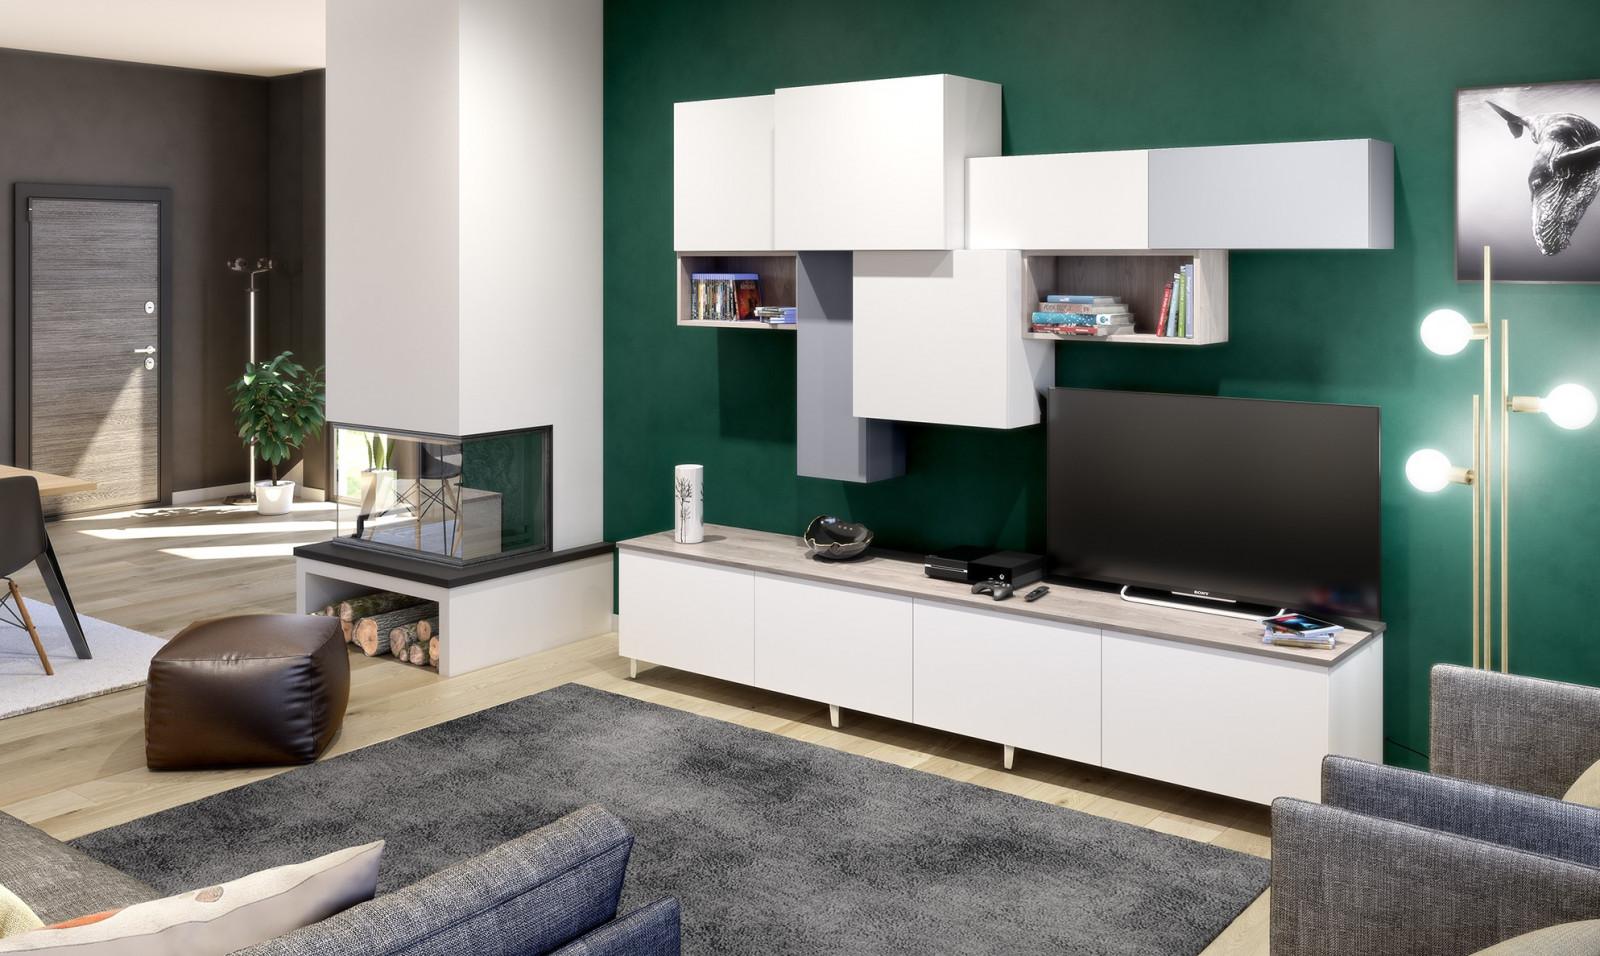 Espace TV avec rangements optimisés